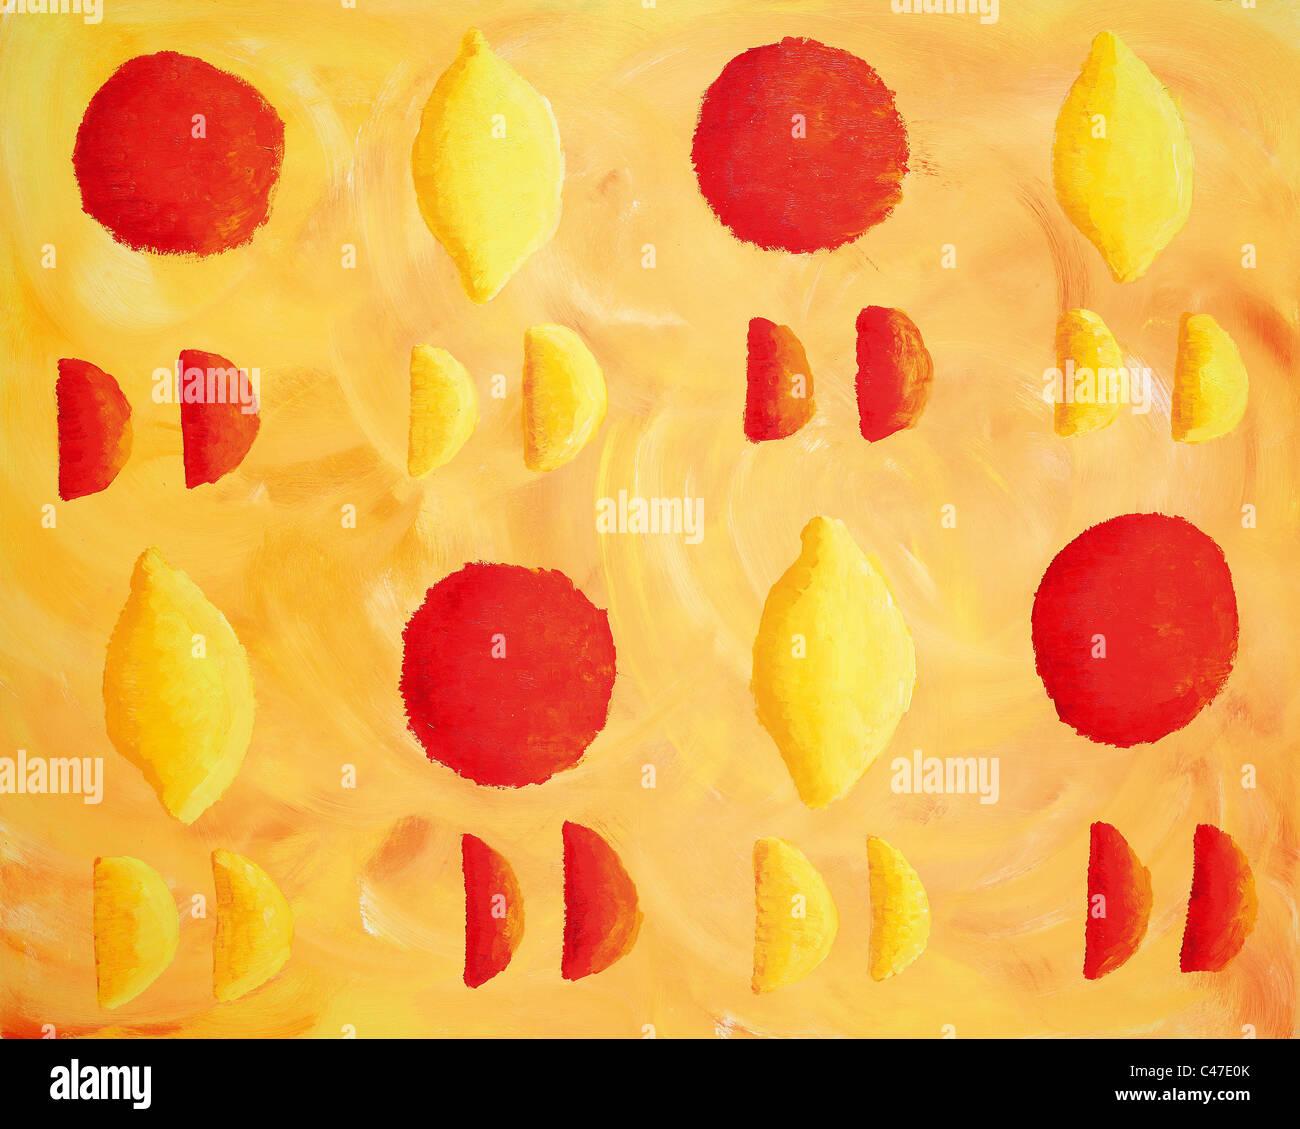 Acrylic painting of oranges and lemons. - Stock Image